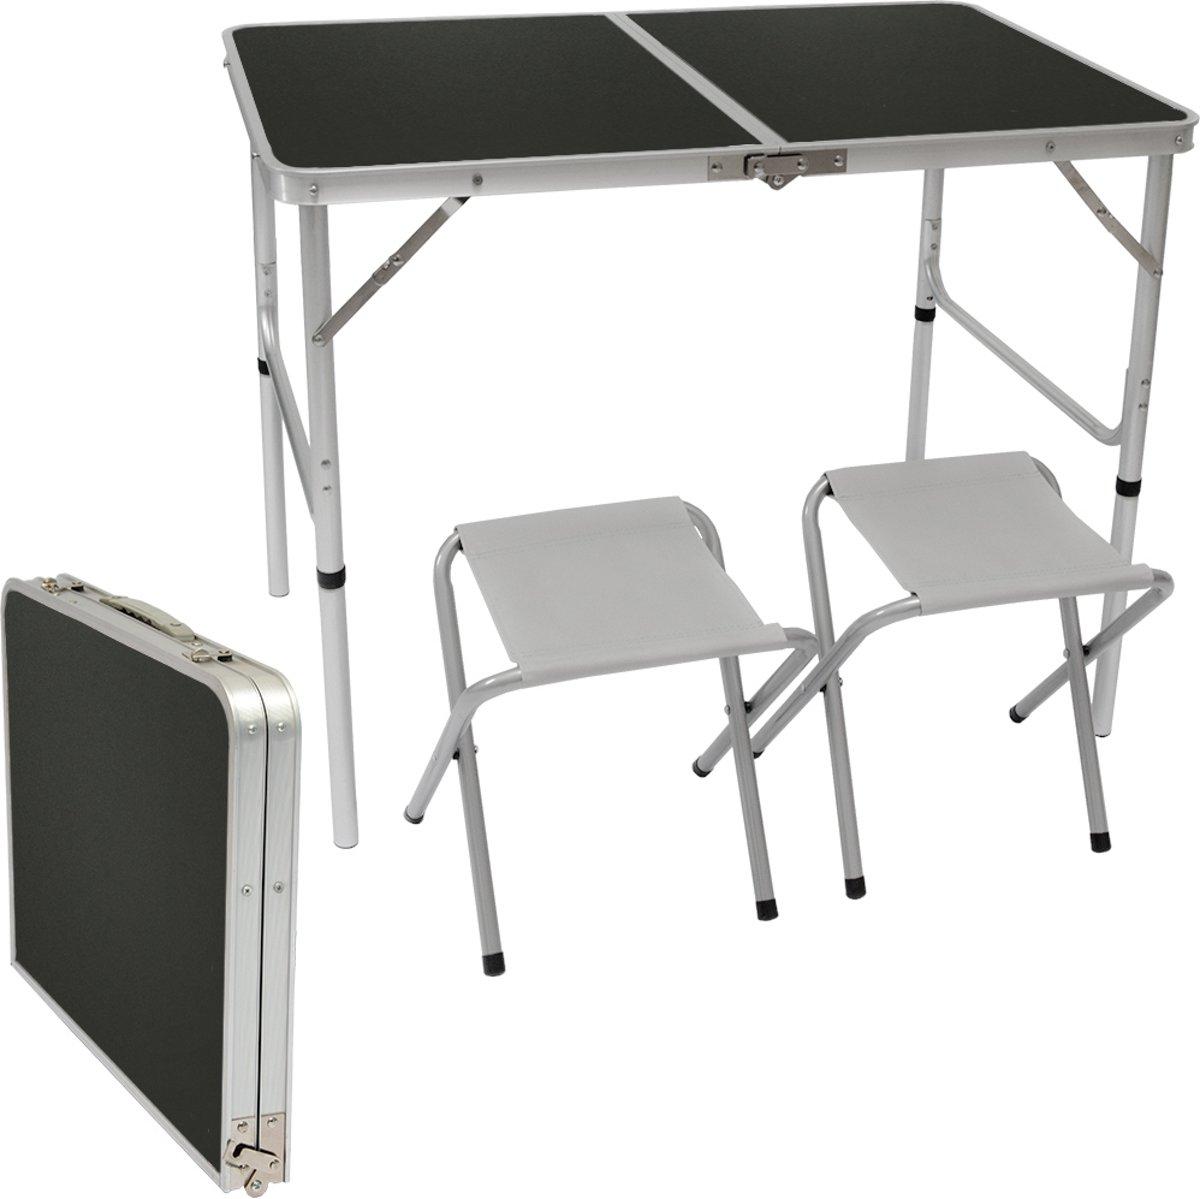 In hoogte verstelbare campingtafel 90x60x70 cm incl. 2 inklapbare krukken Campingtafelenset Kofferma